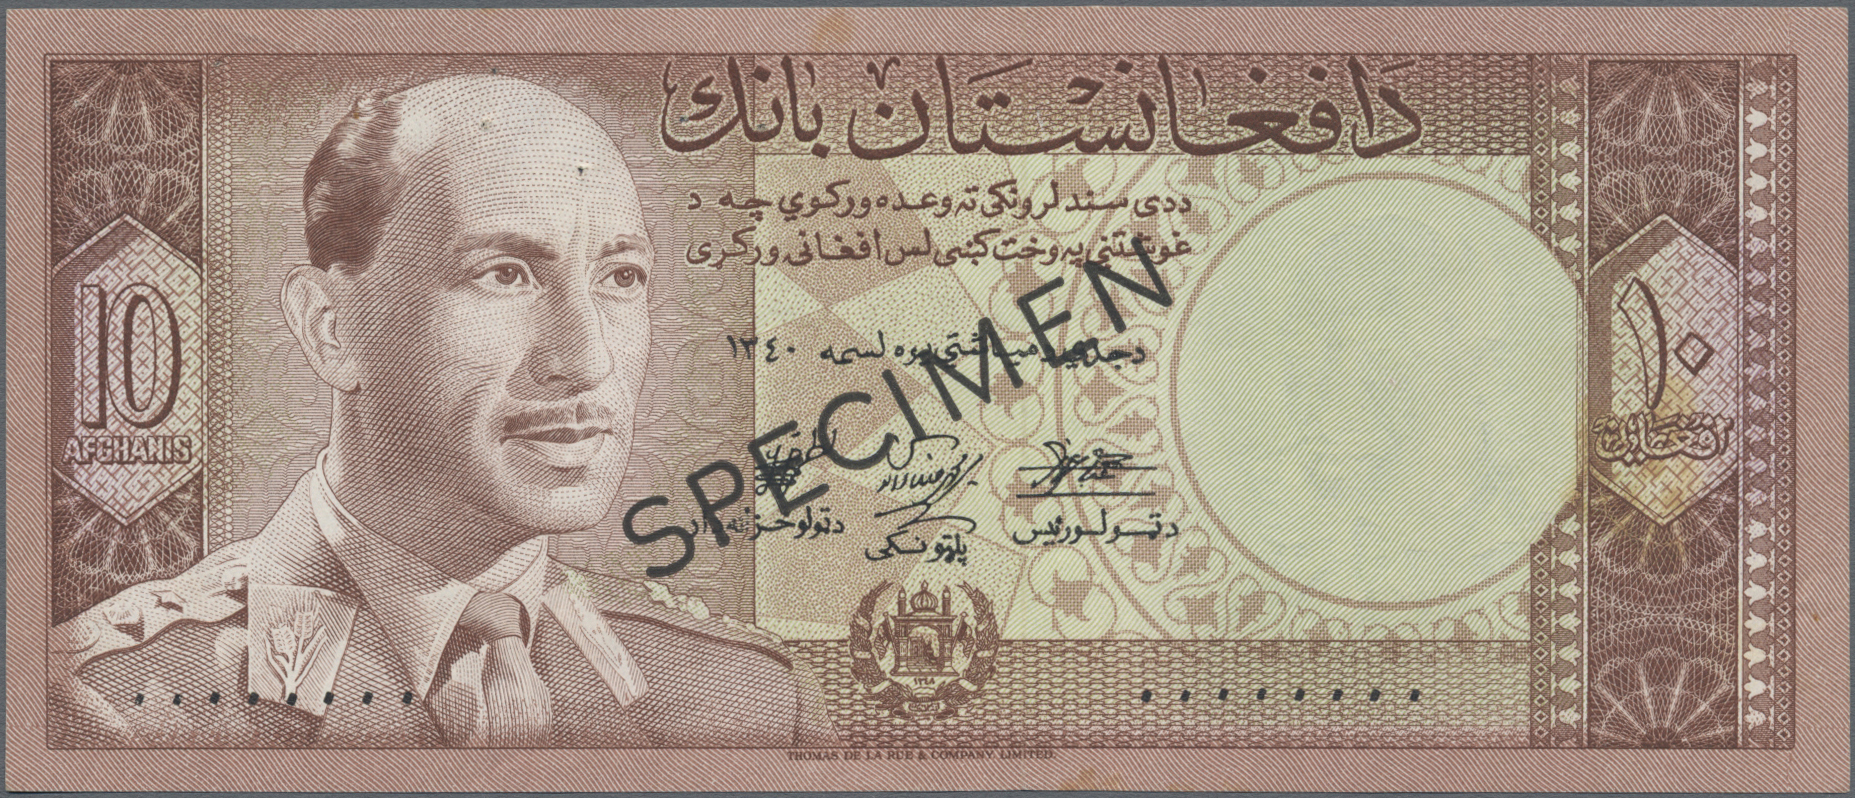 Lot 00003 - Afghanistan | Banknoten  -  Auktionshaus Christoph Gärtner GmbH & Co. KG Sale #48 The Banknotes